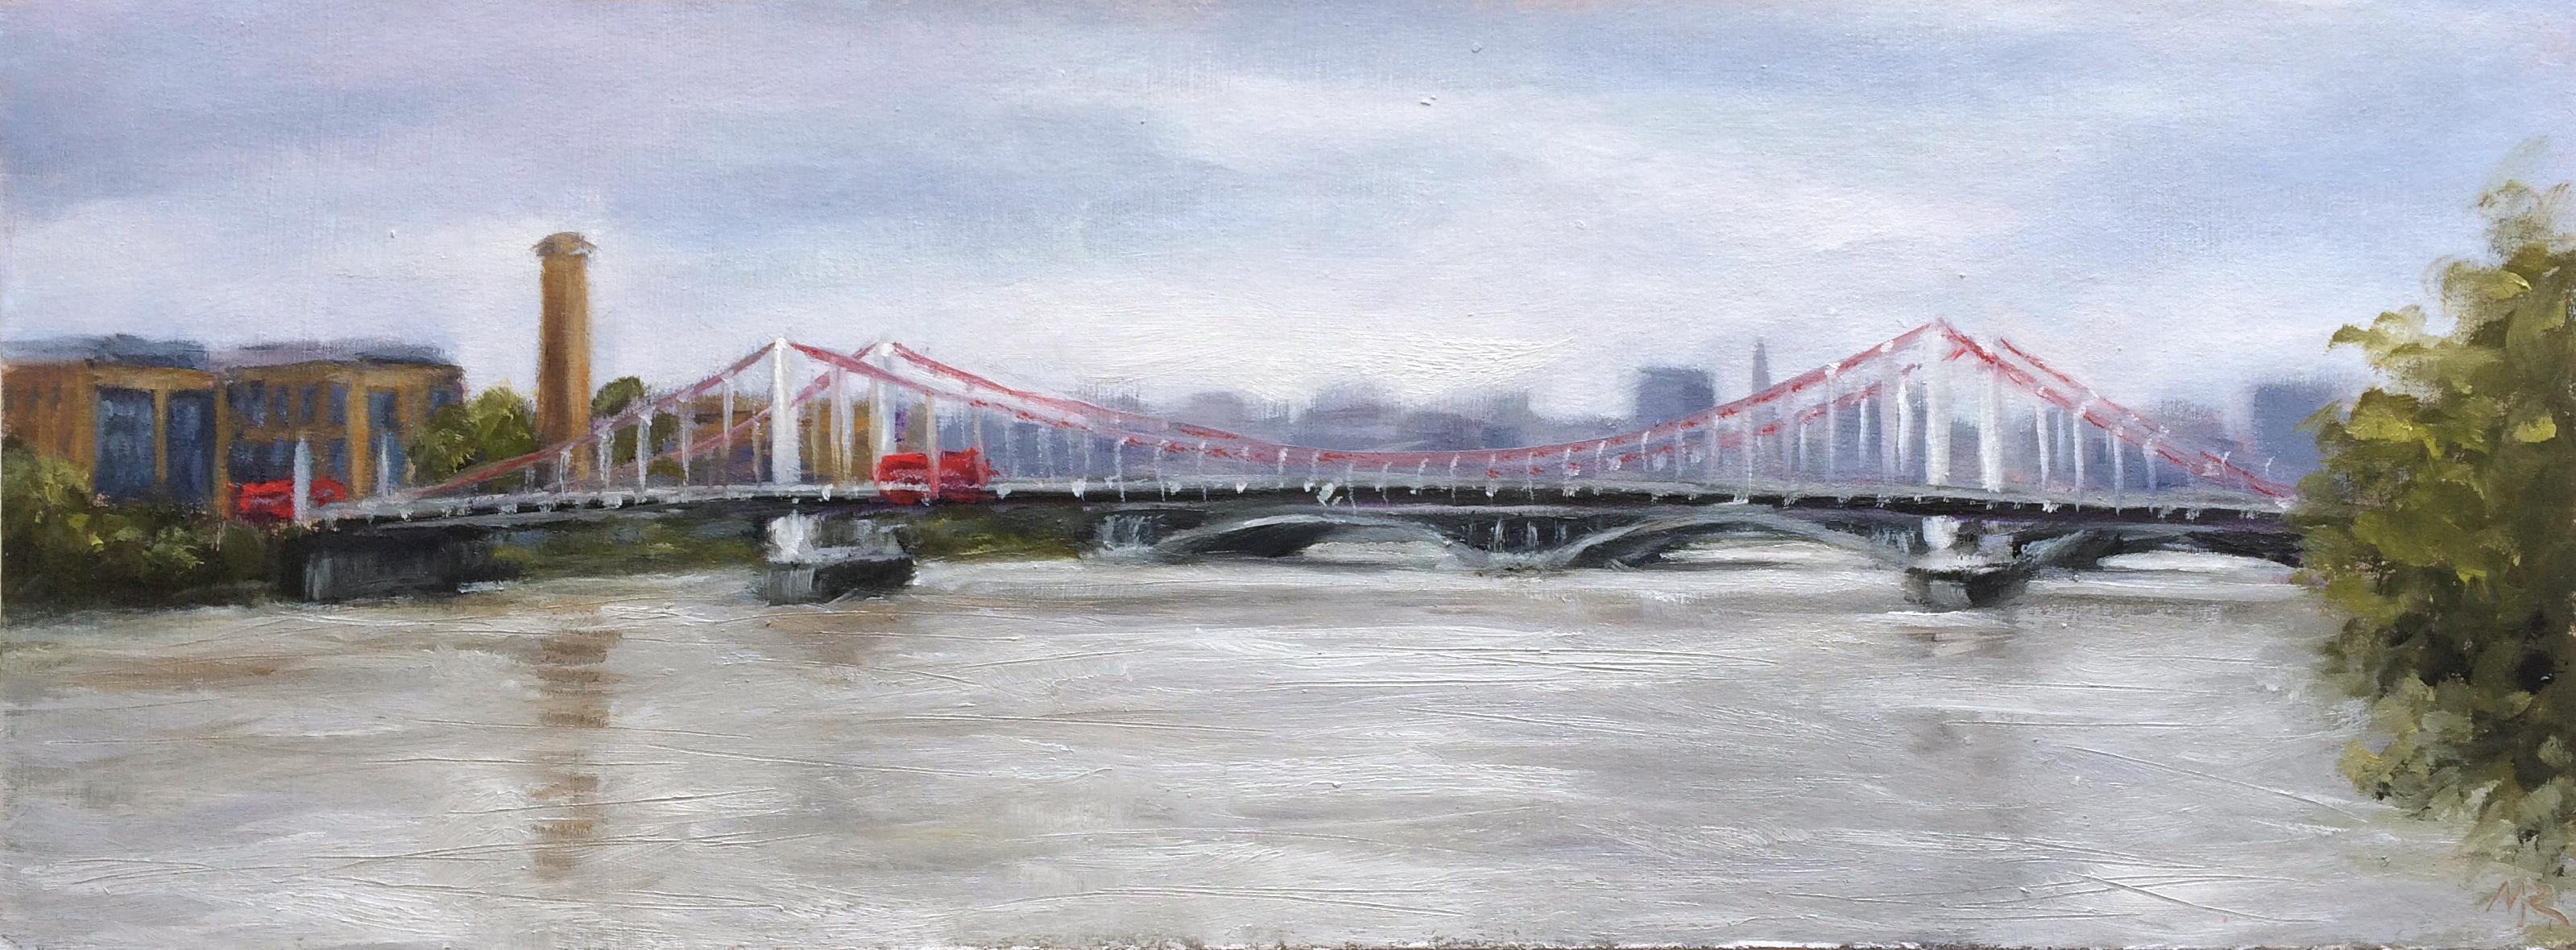 Grey Skies over Chelsea Bridge